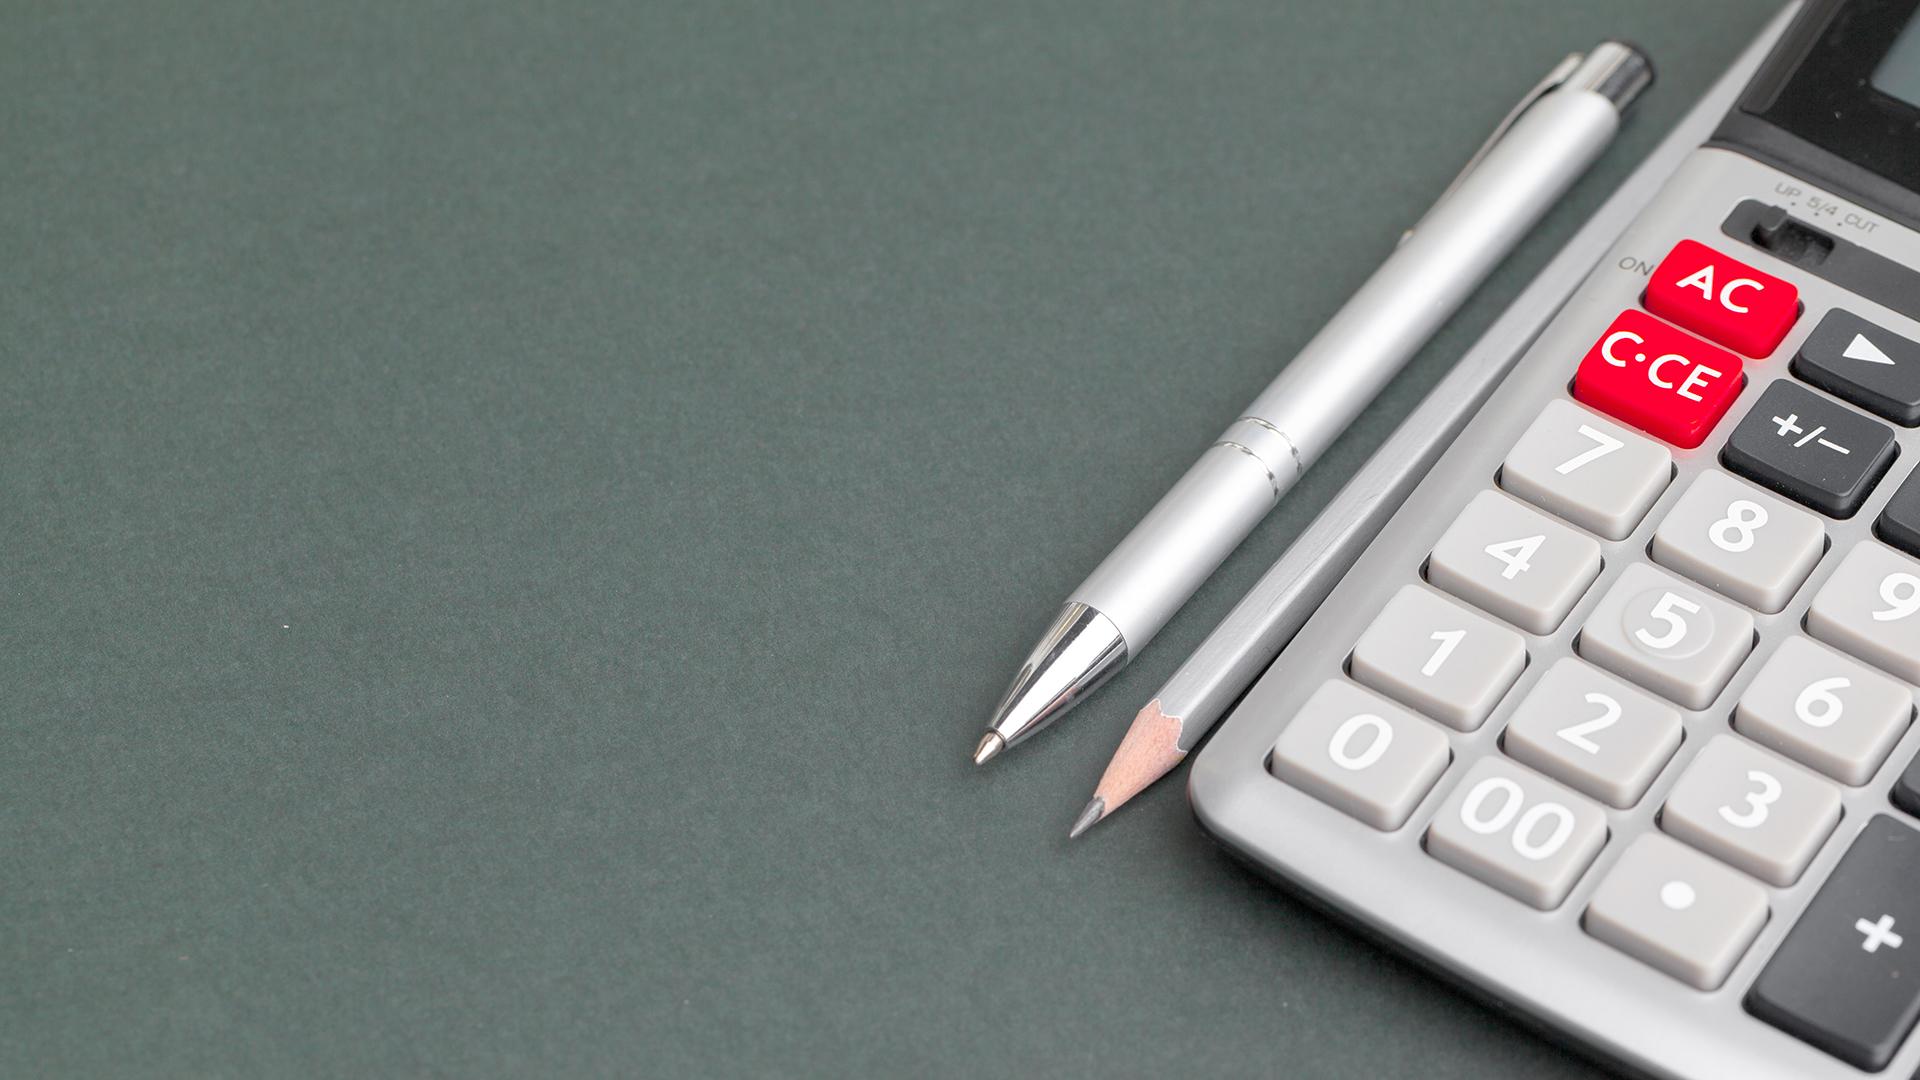 Pen, pencil and calculator